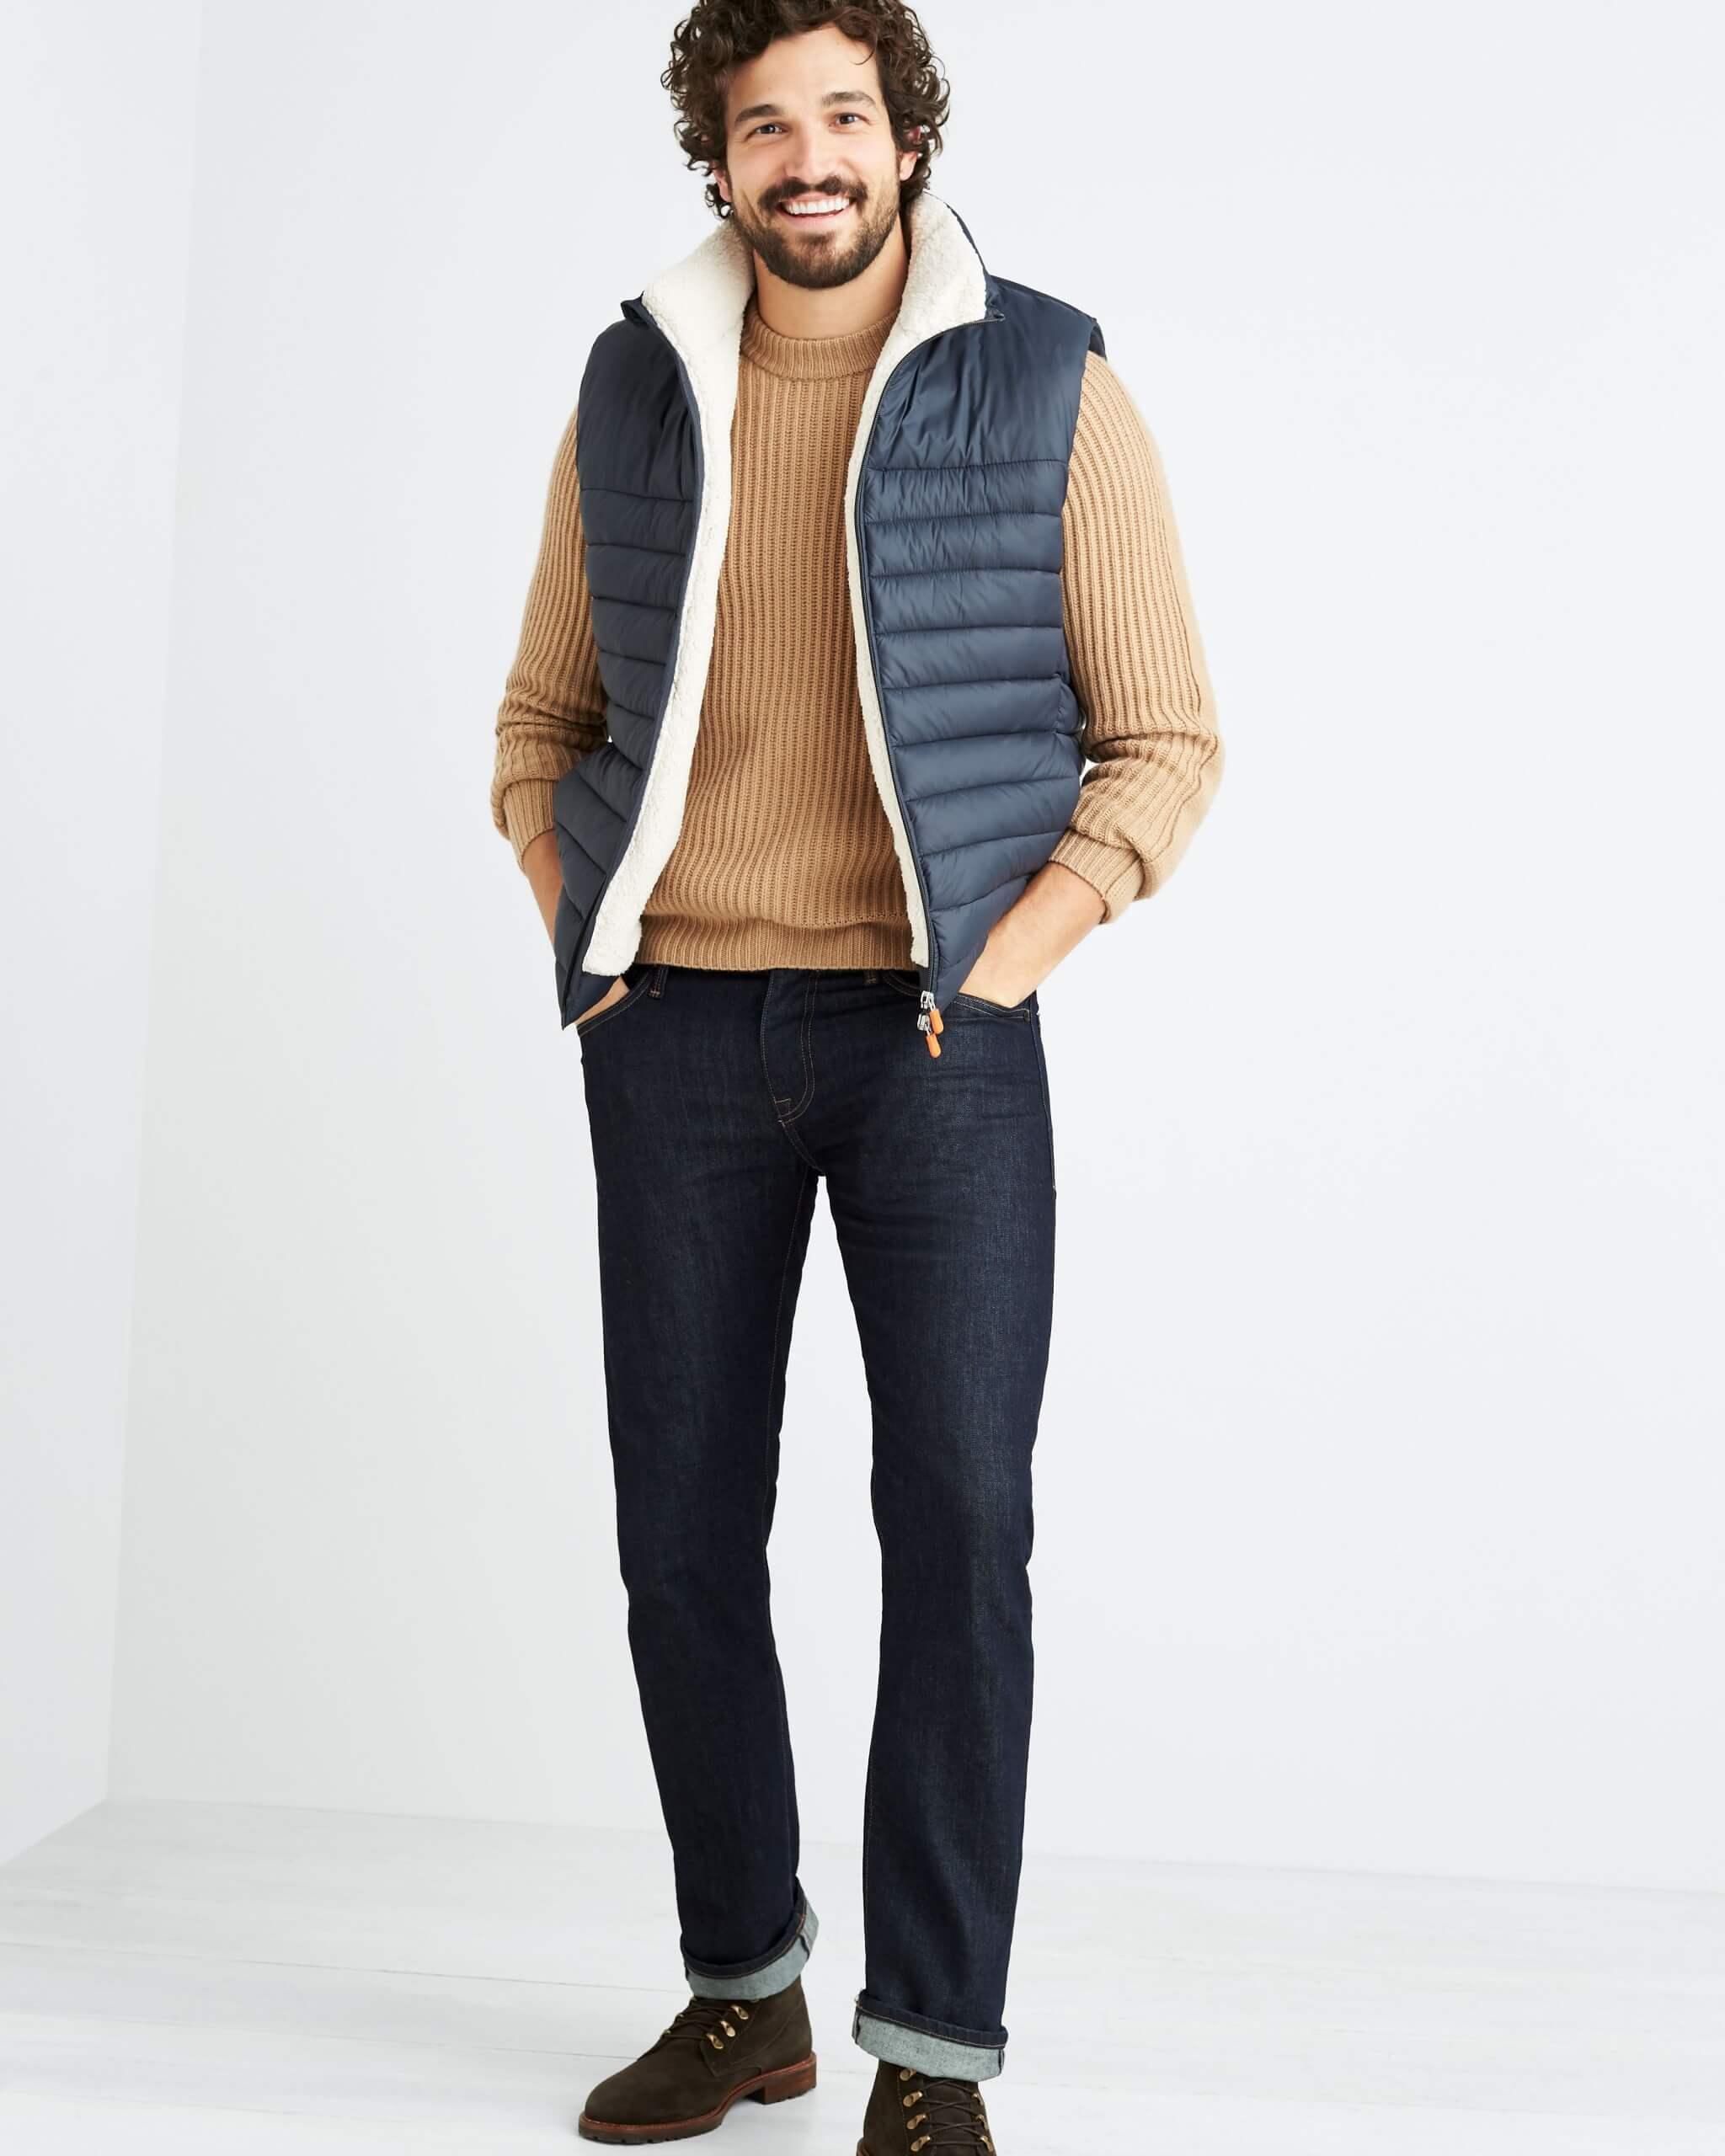 Stitch Fix Men's model wearing dark wash jeans, brown crewneck sweater, navy puffer vest and brown boots.